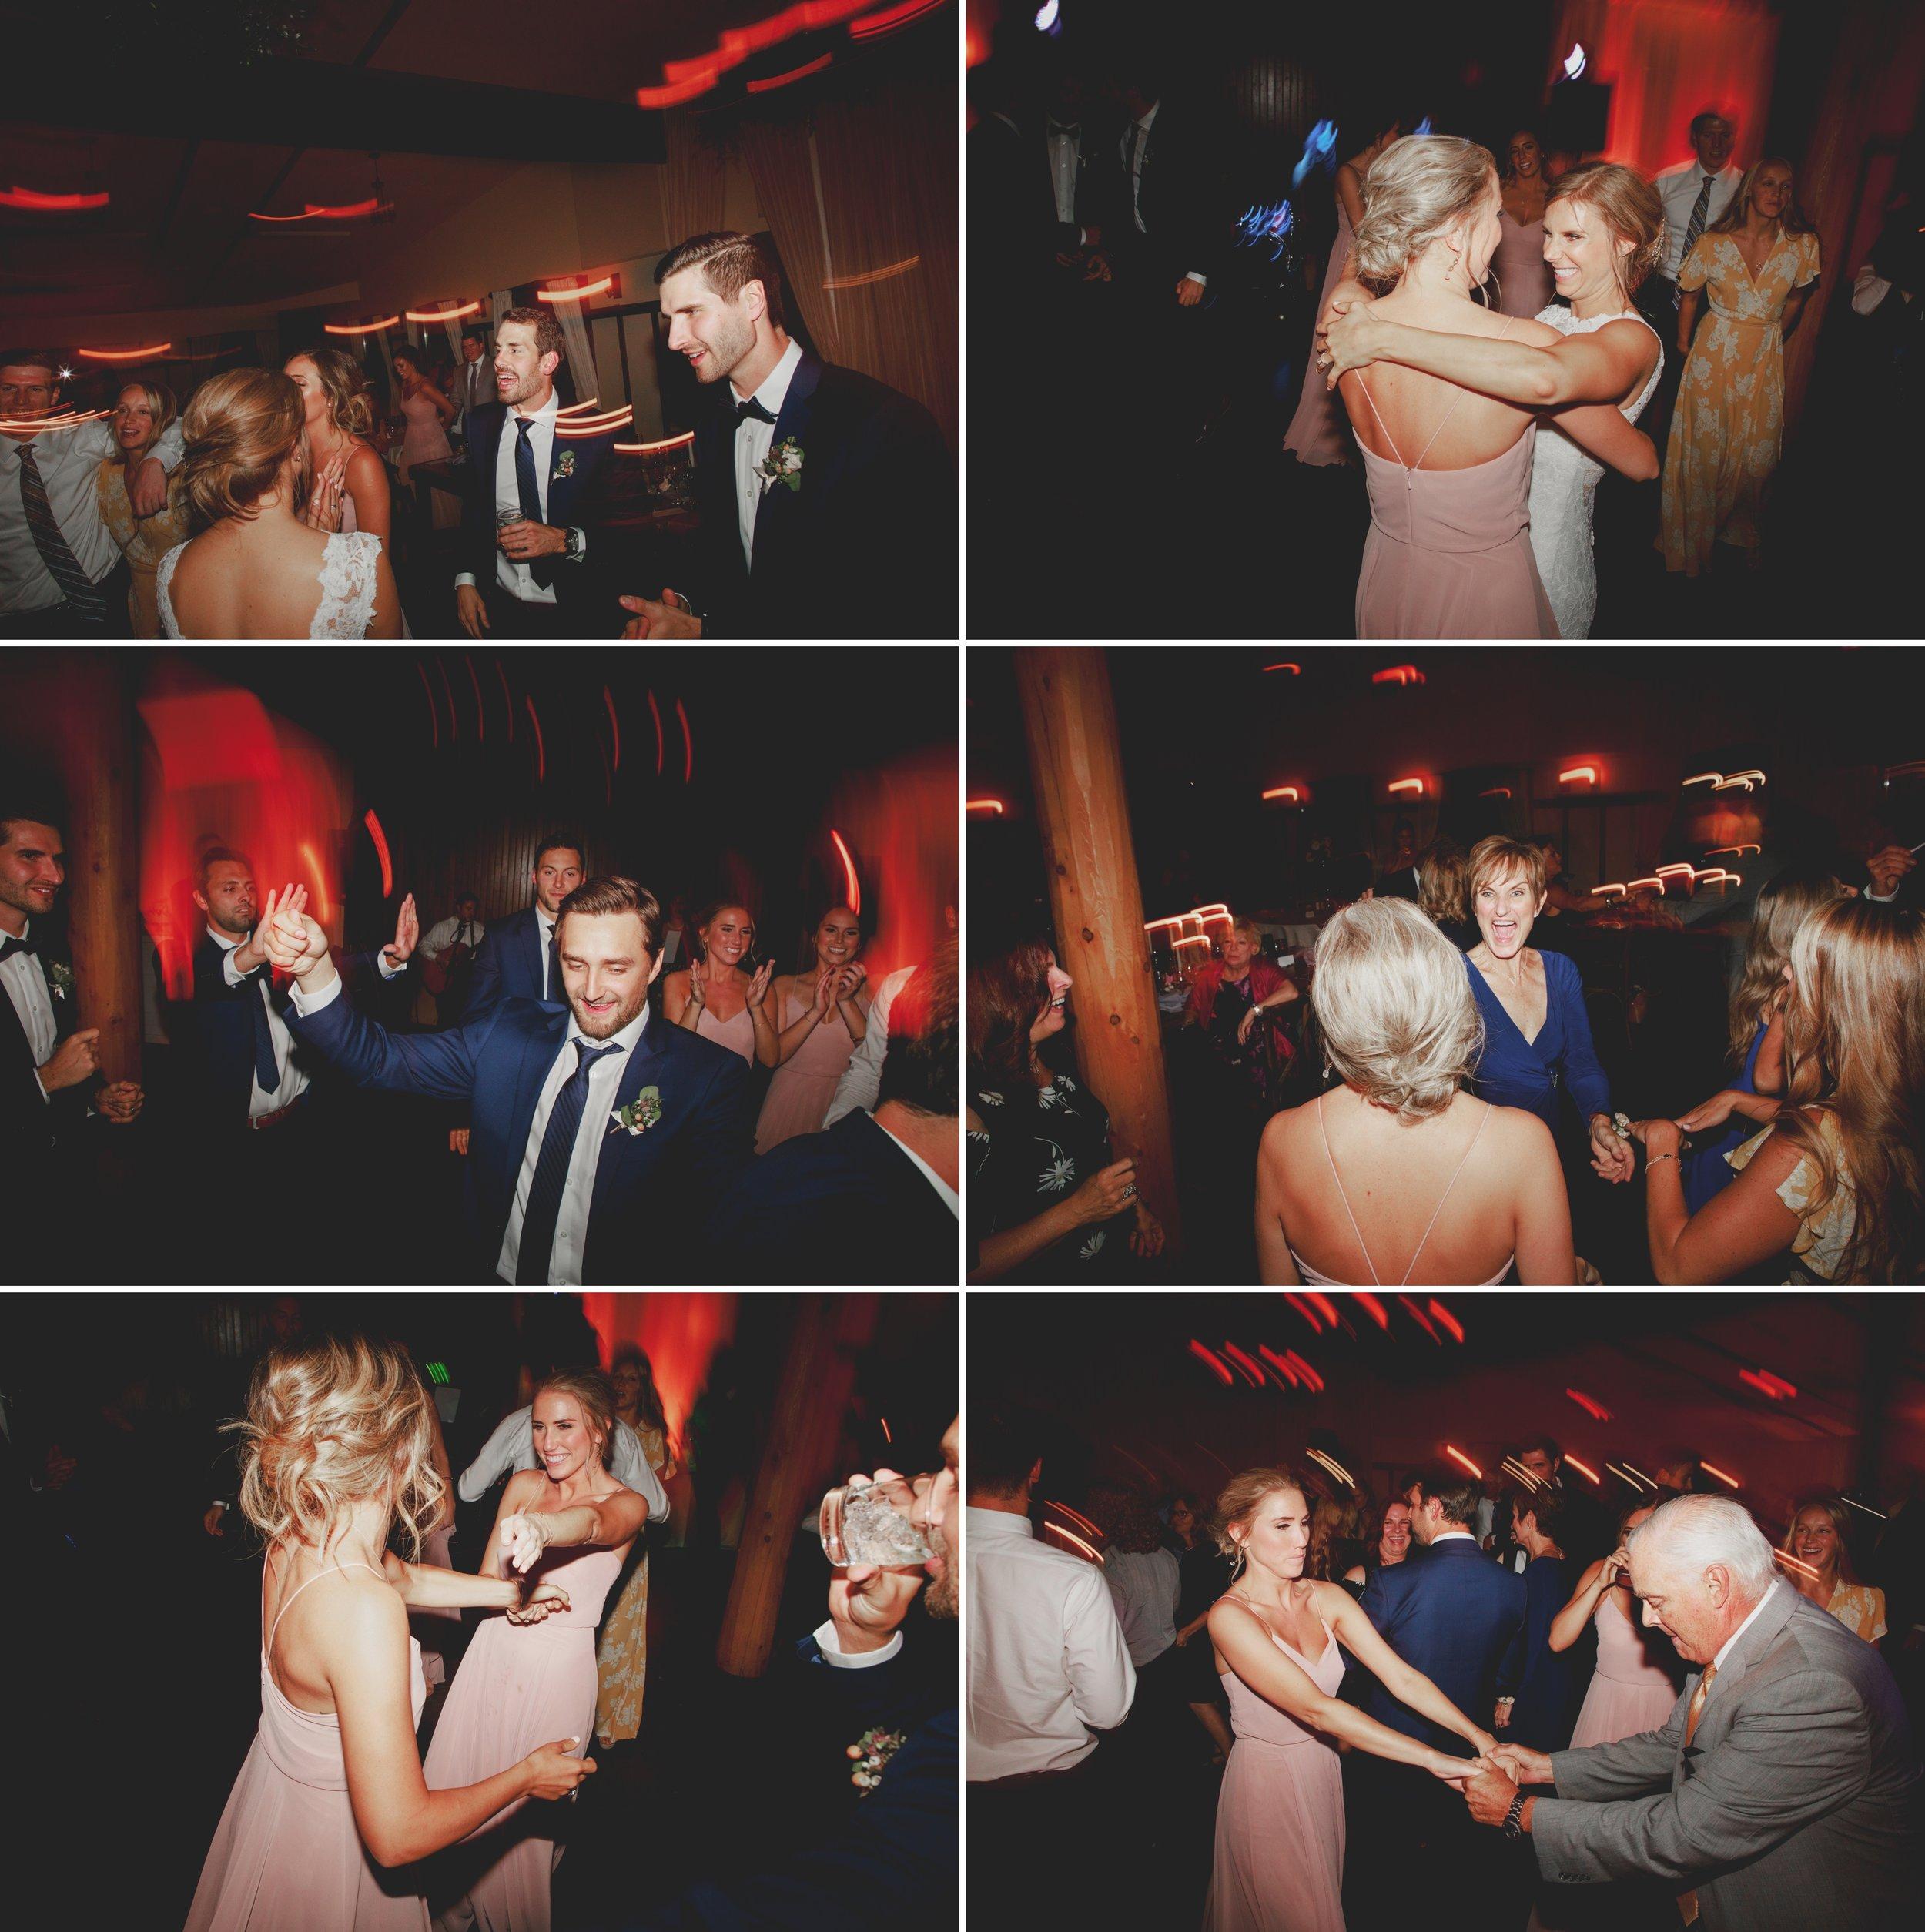 traverse_city_wedding_173.jpg